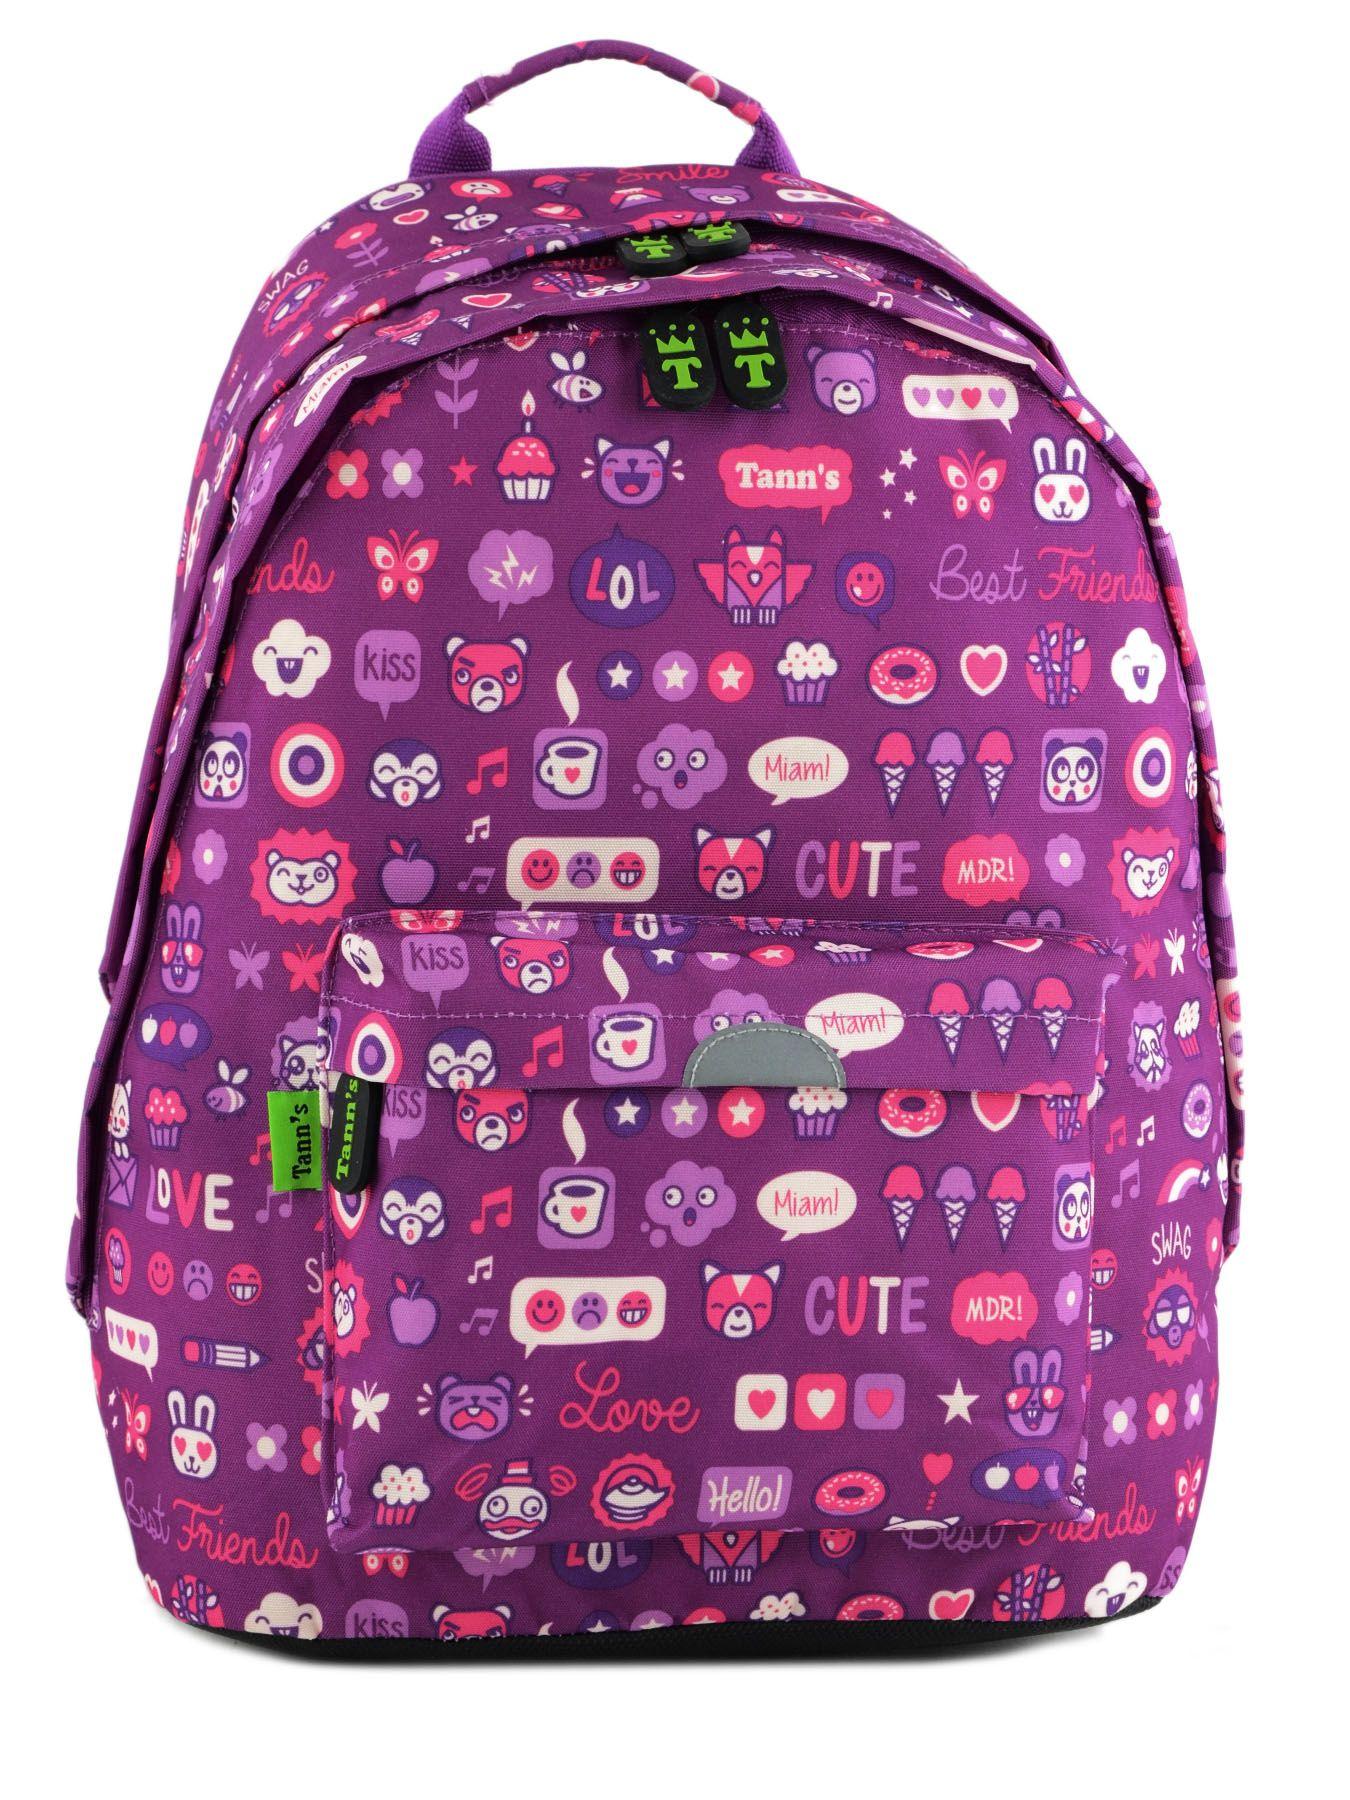 fun girl tann 39 s backpack 4fgsadmd best prices. Black Bedroom Furniture Sets. Home Design Ideas